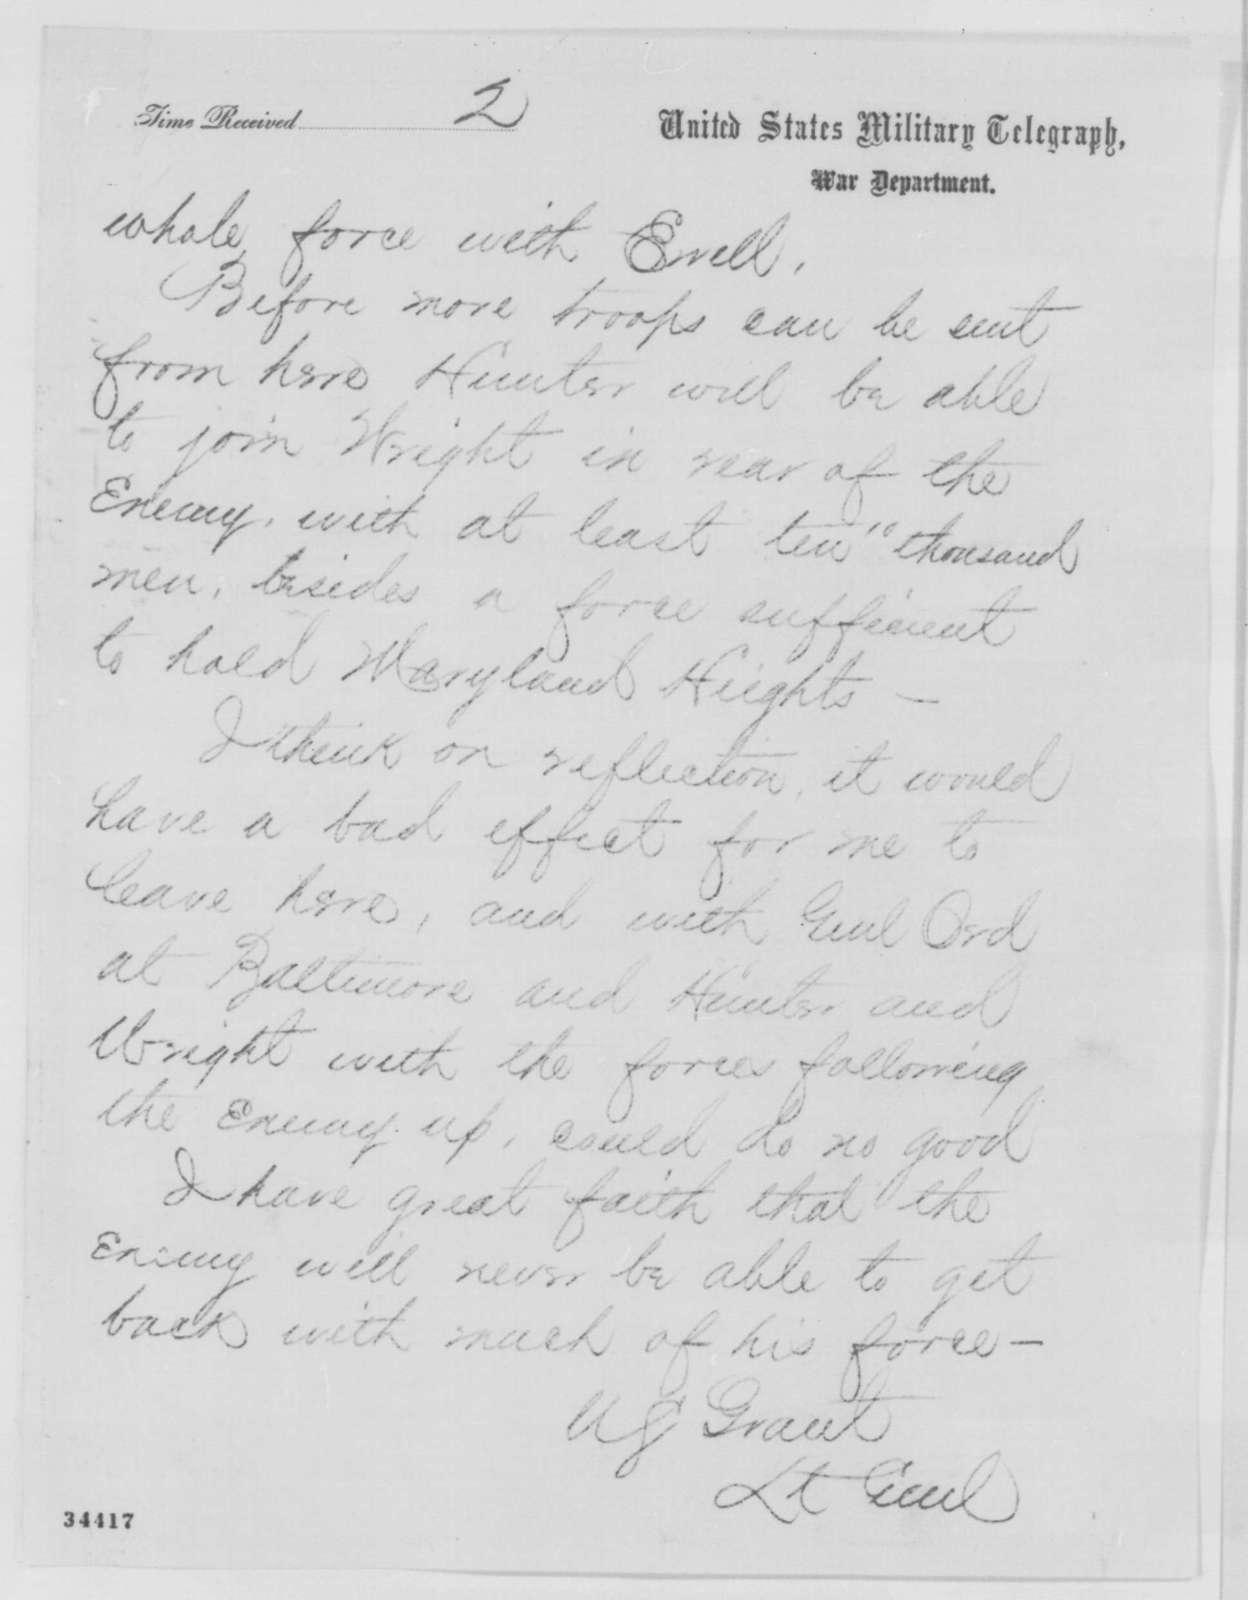 Ulysses S. Grant to Abraham Lincoln, Sunday, July 10, 1864  (Telegram concerning defense of Washington)